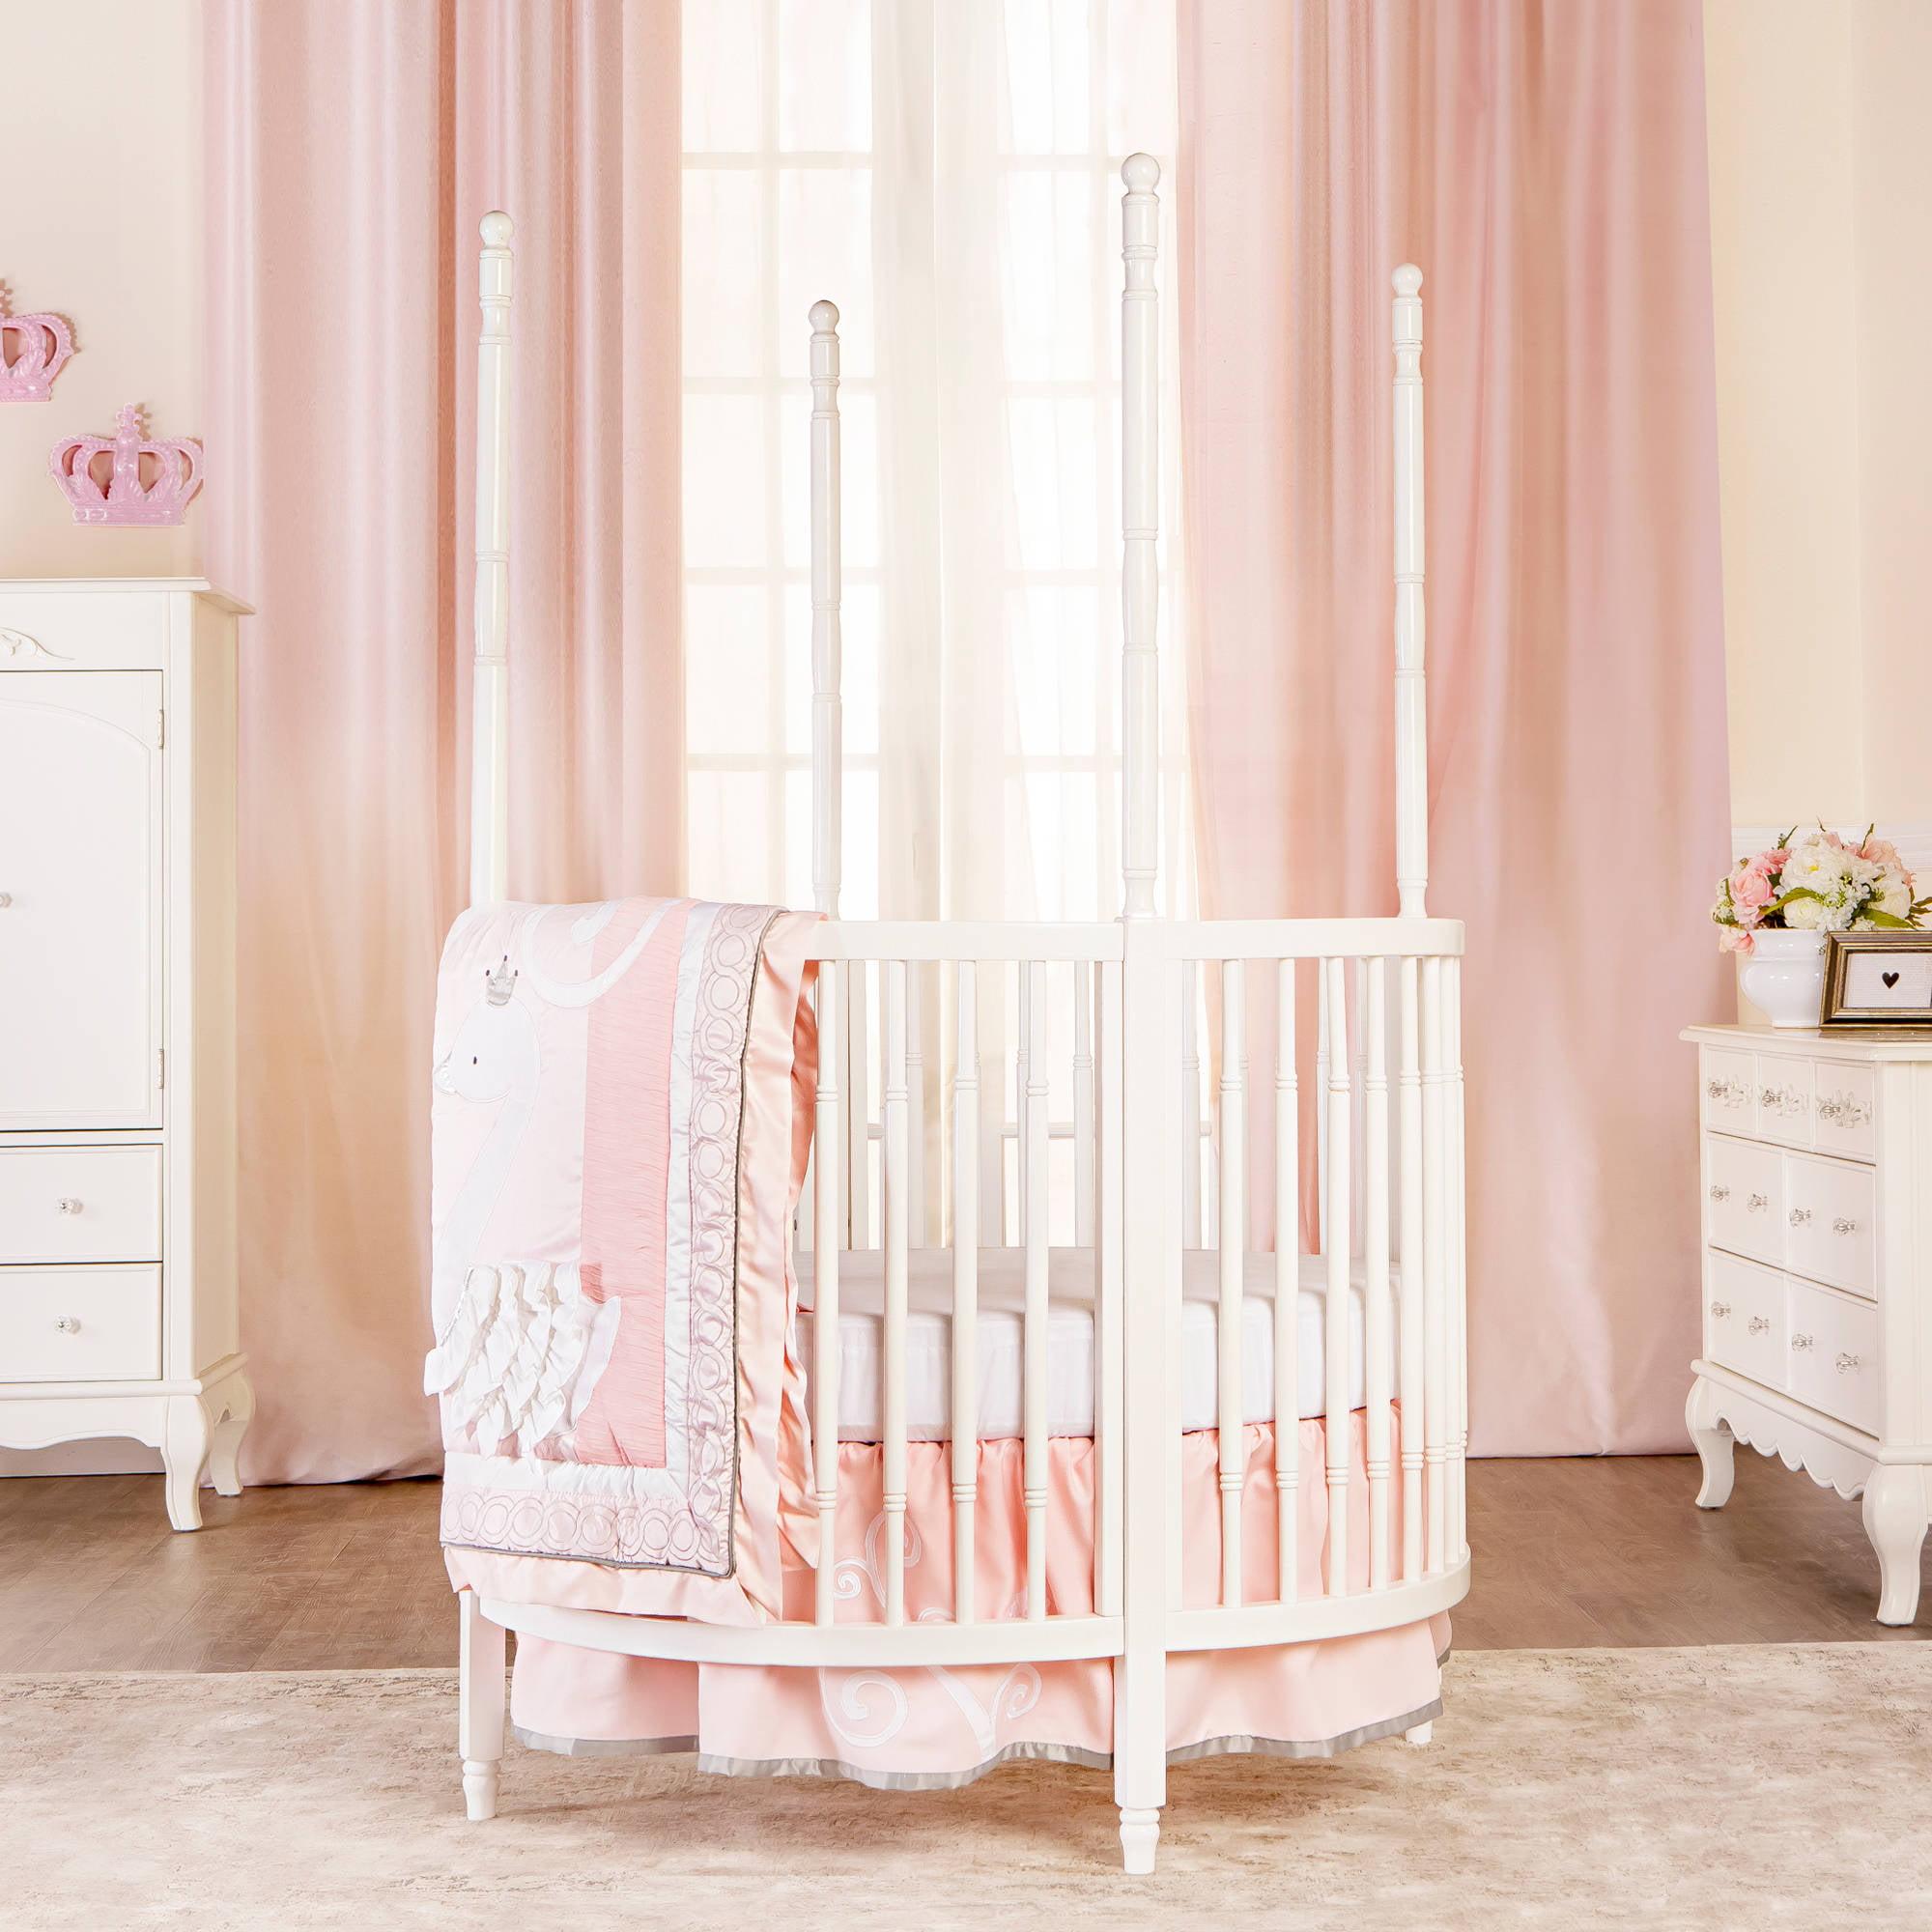 Baby crib for sale tulsa - Baby Crib For Sale Tulsa 54